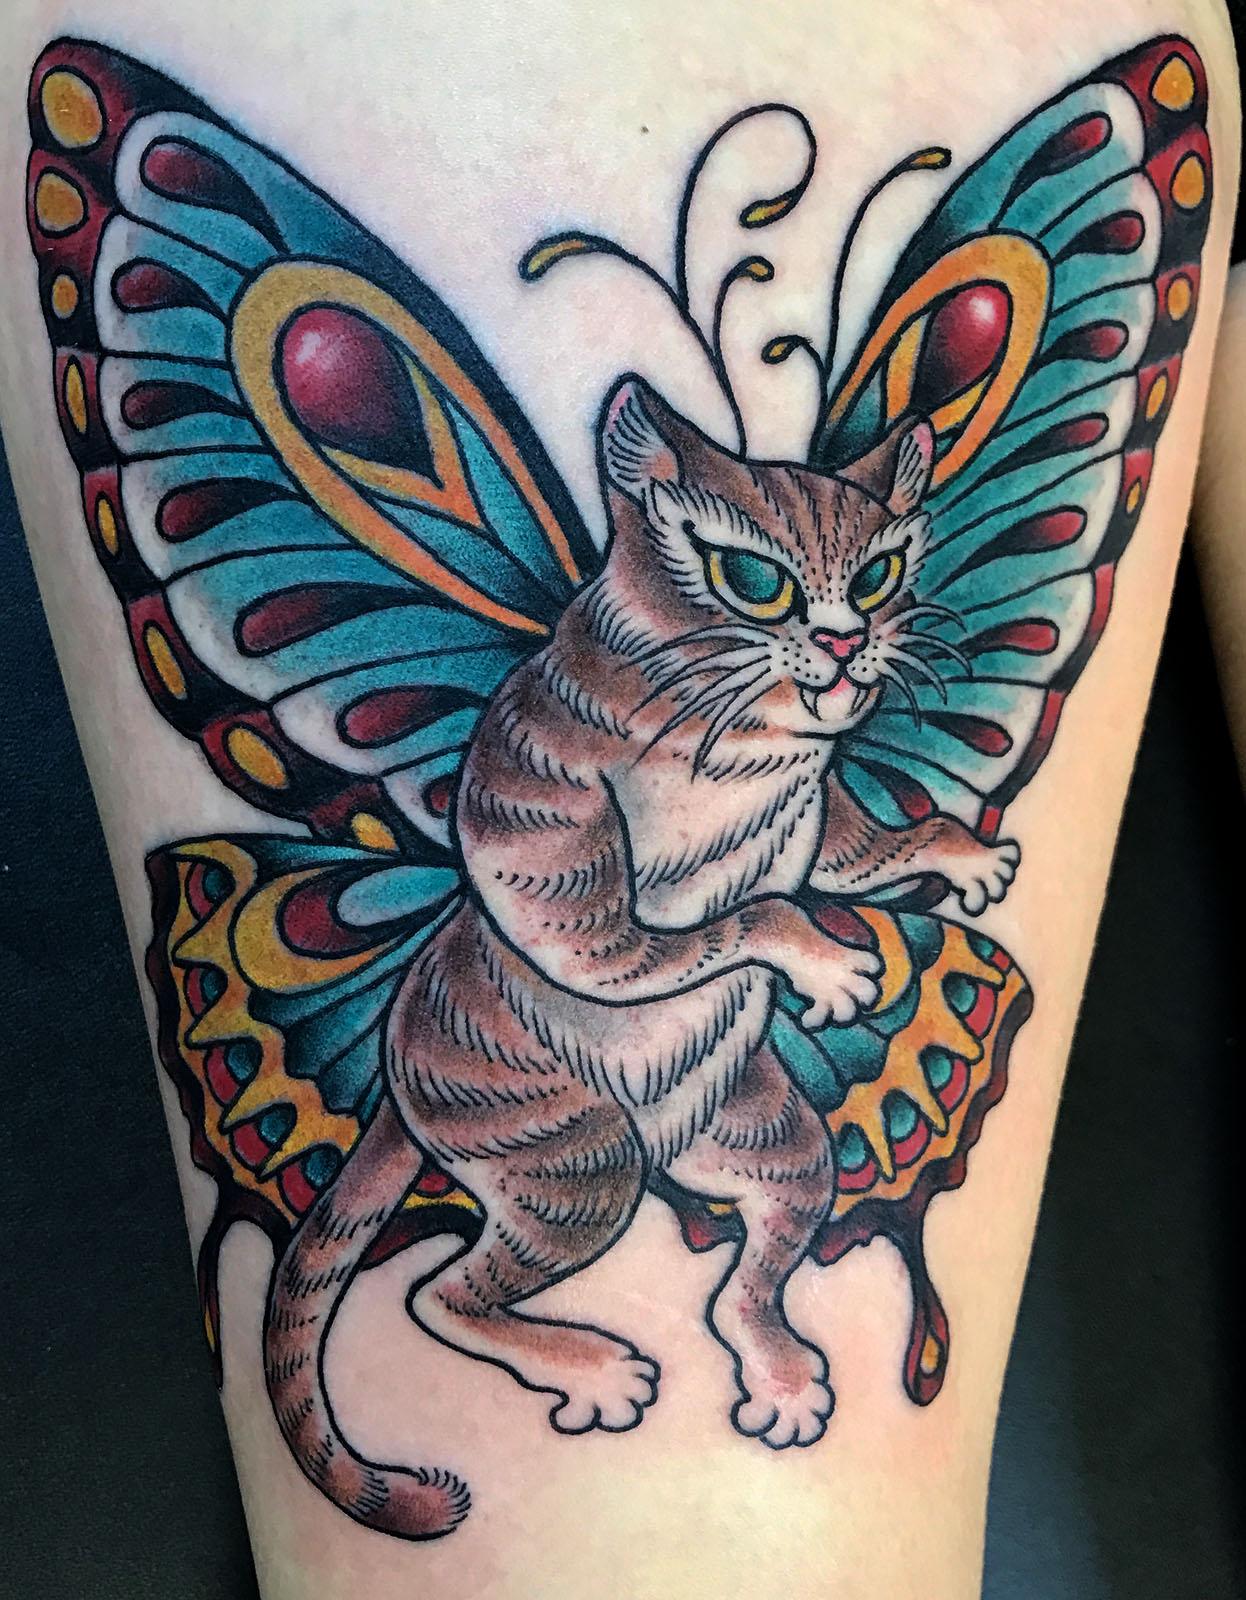 catterfly.jpg